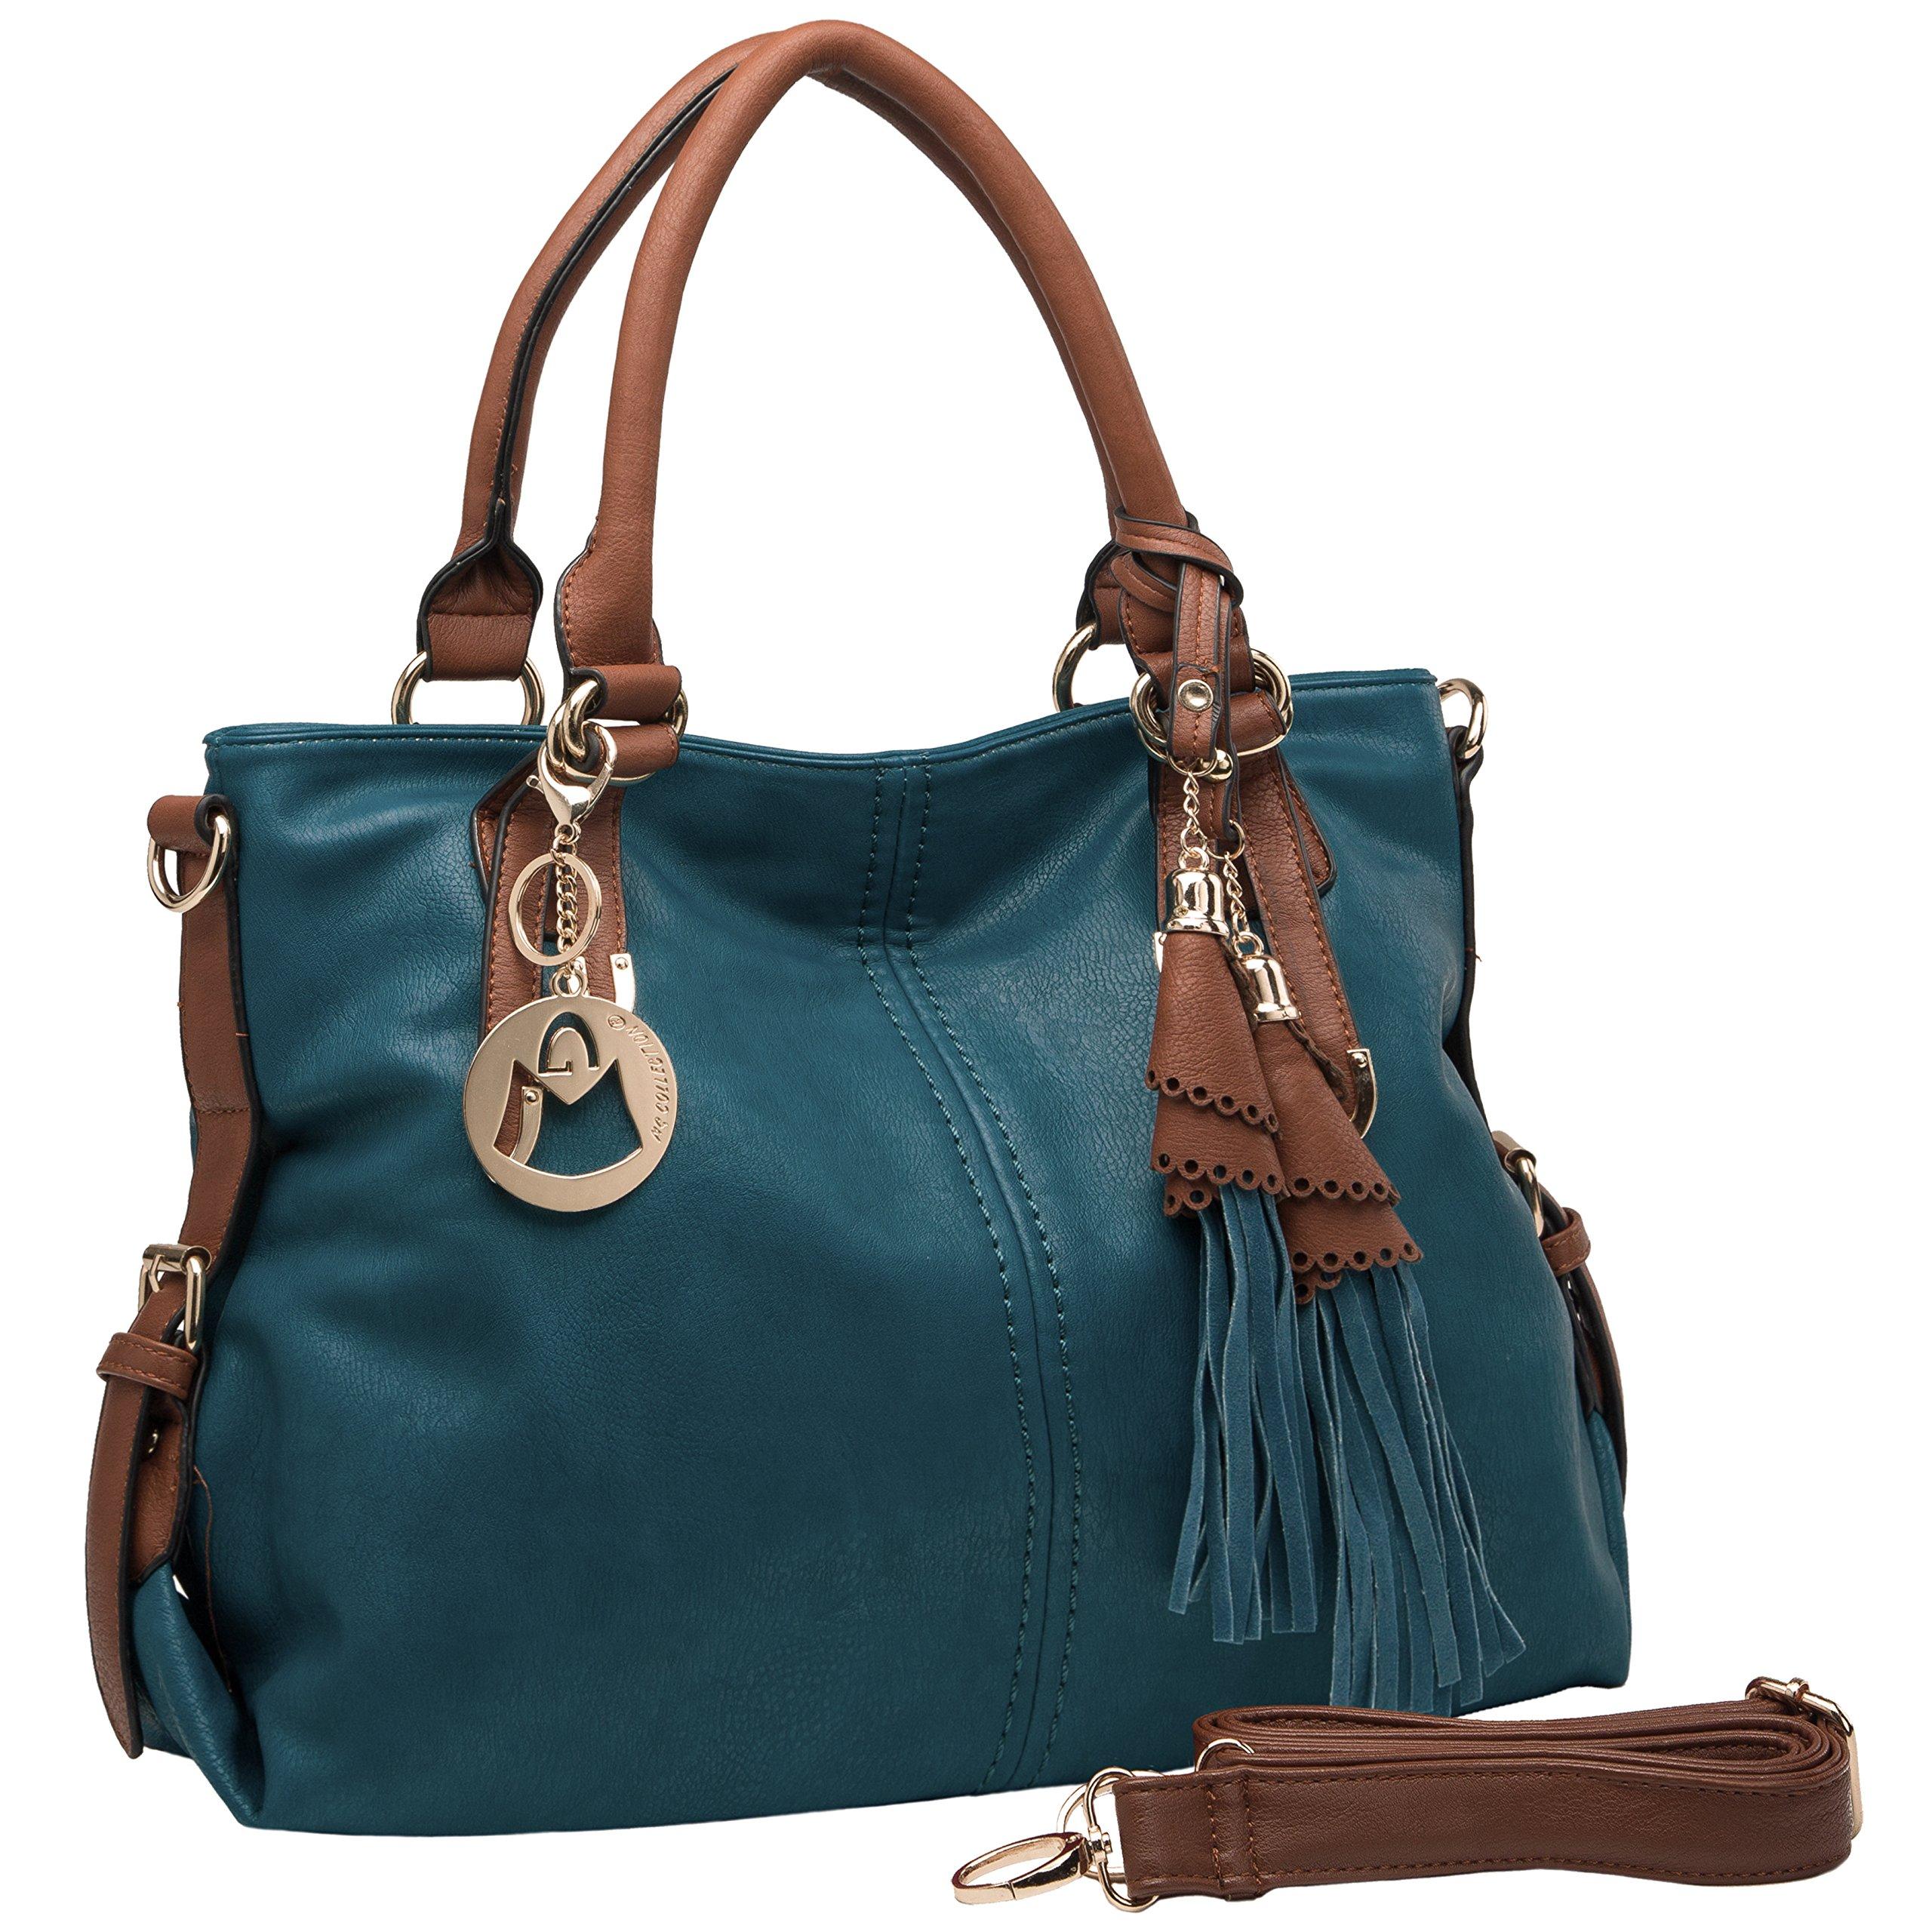 MG Collection THALIA Top Handle Tassel Decor Hobo Style Tote Purse/Shoulderbag